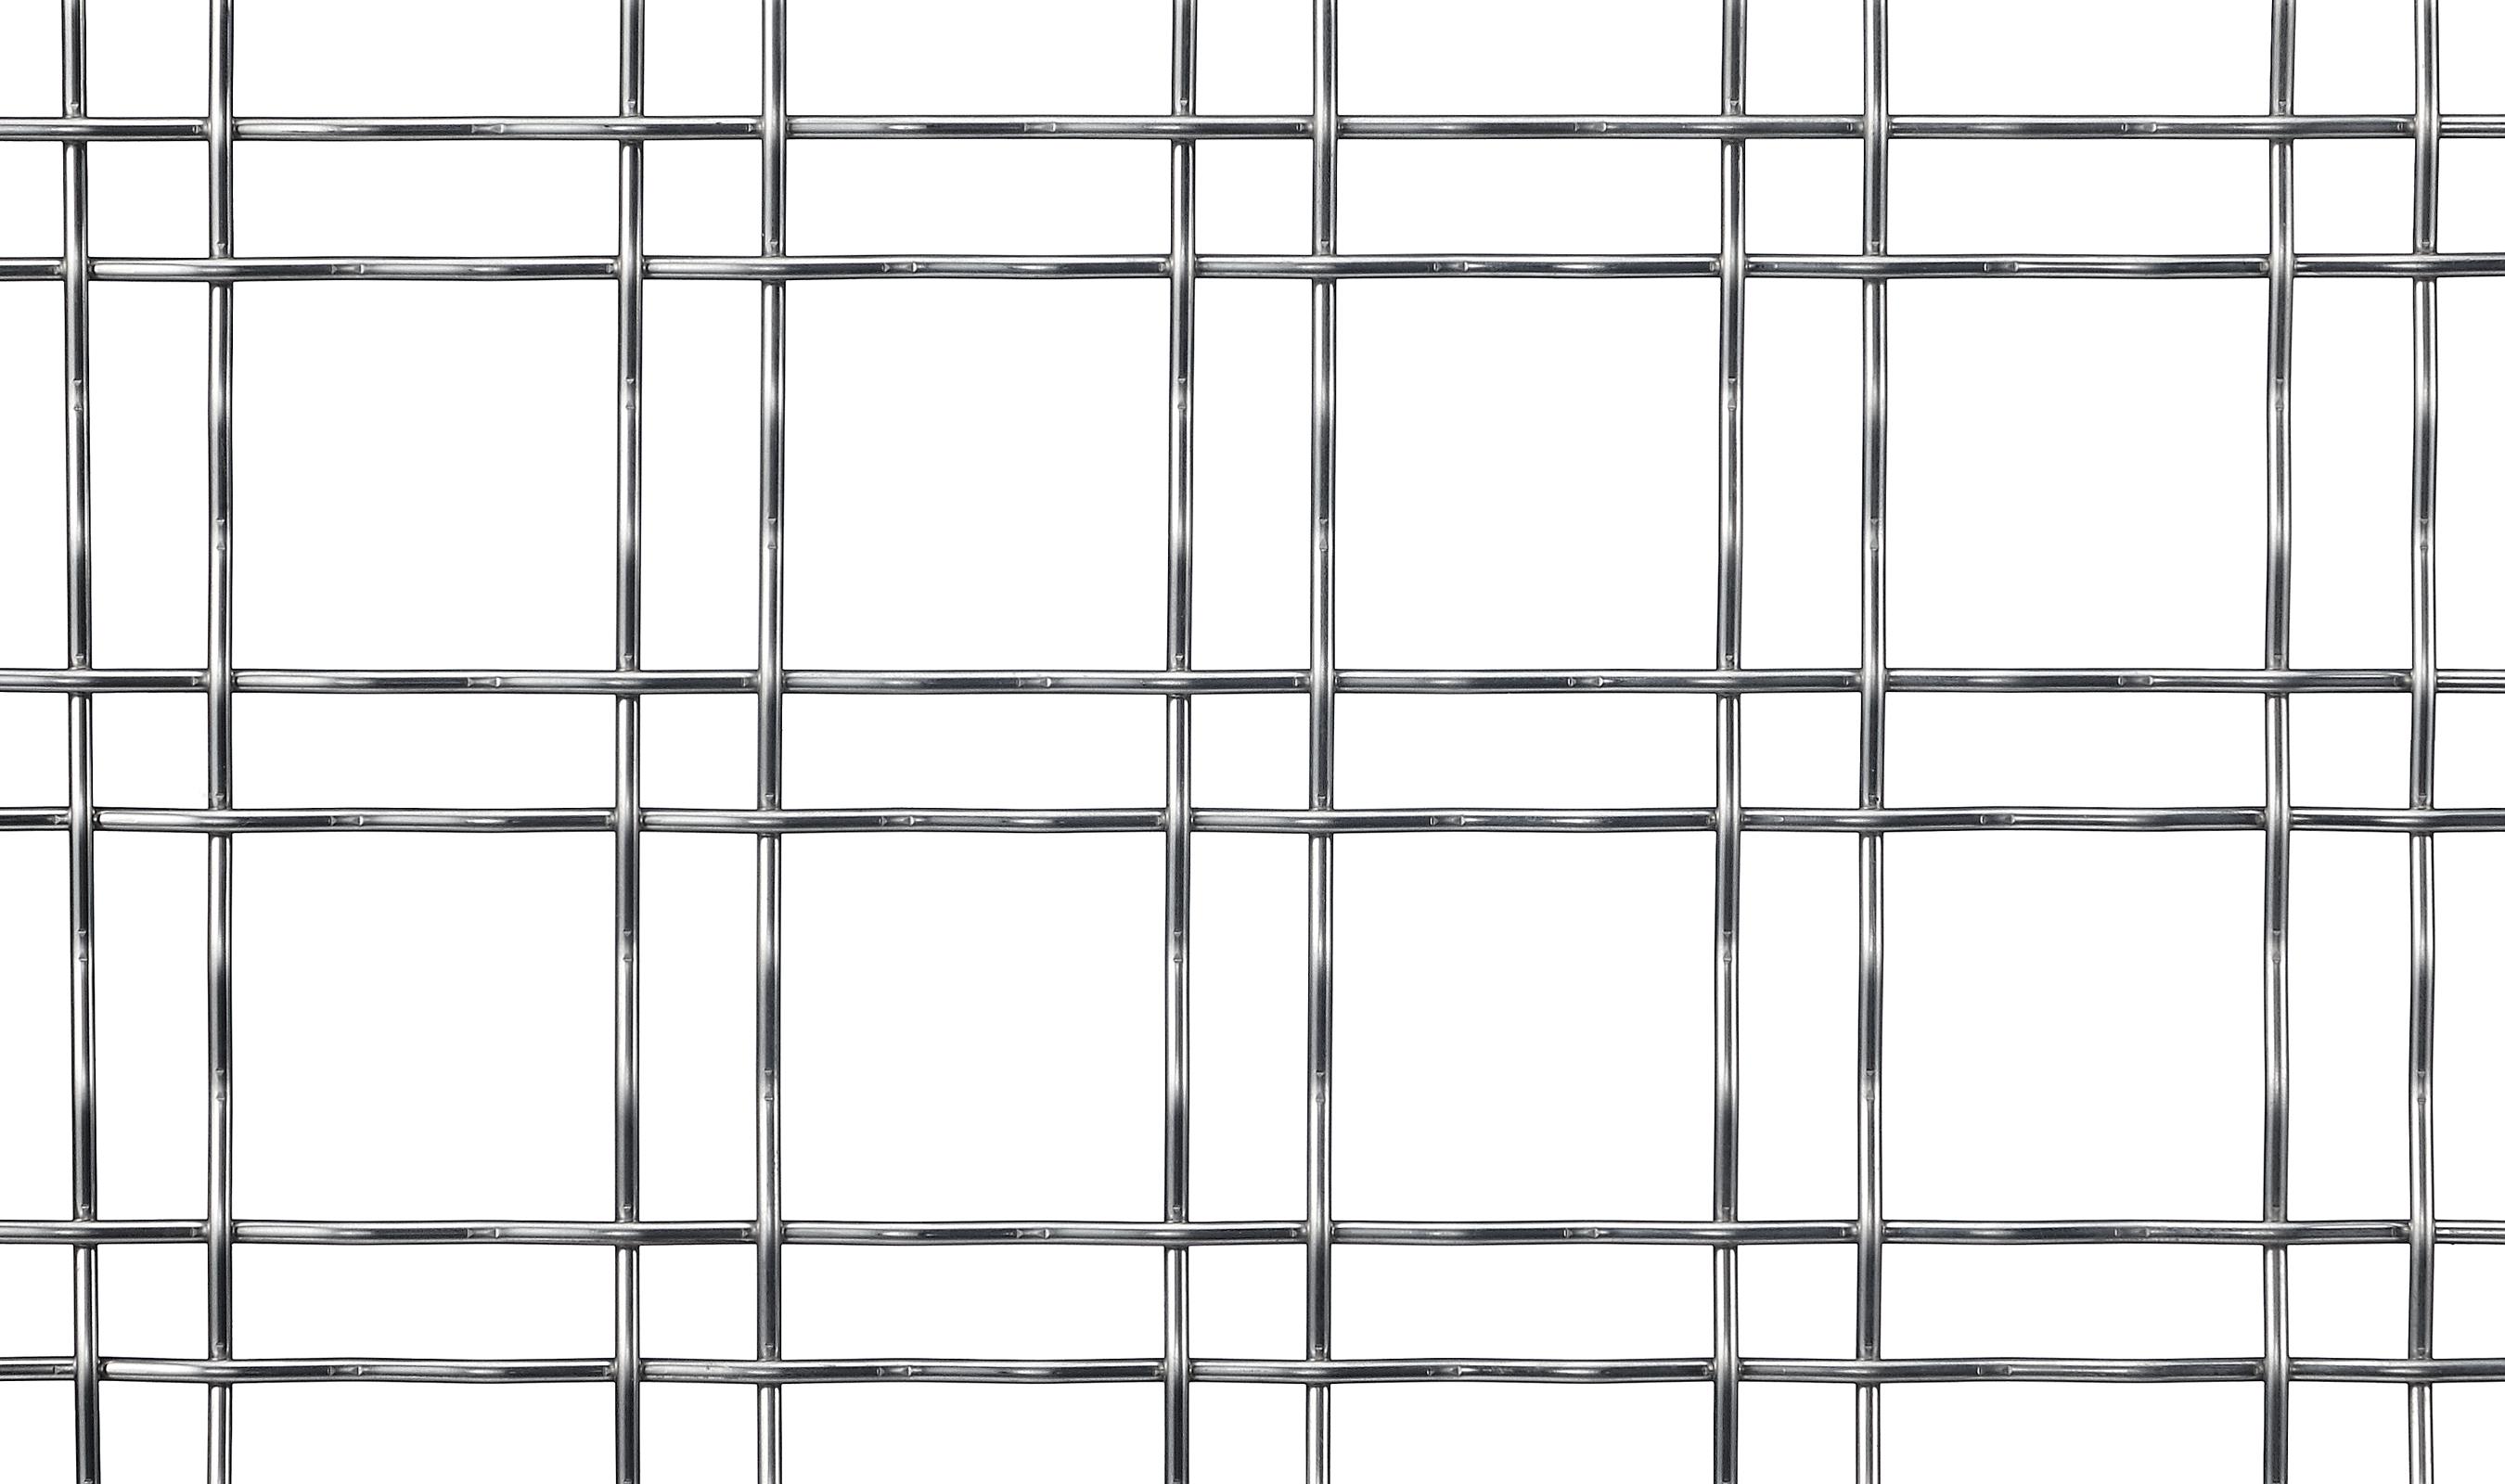 M22-14 Architectural wire mesh pattern